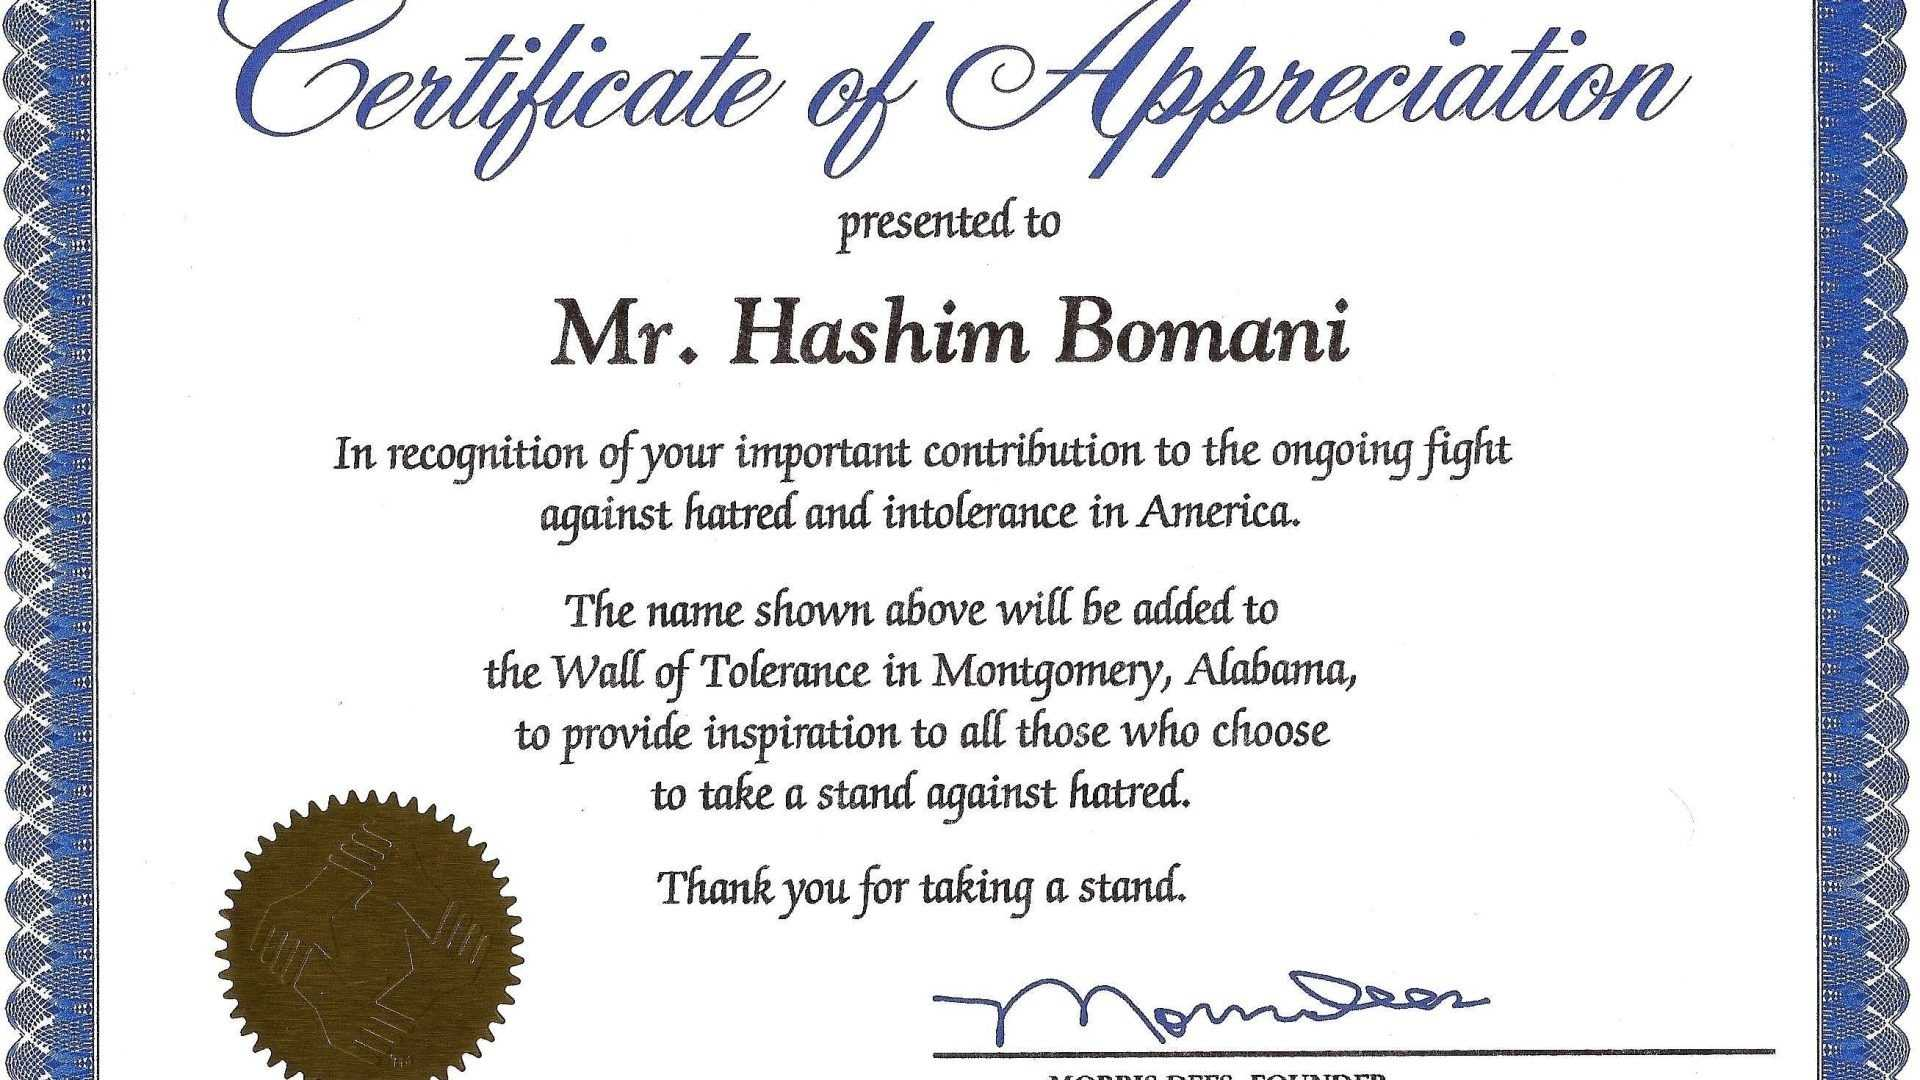 037 Certificates Of Appreciation Templates Free Sample Inside Free Funny Certificate Templates For Word